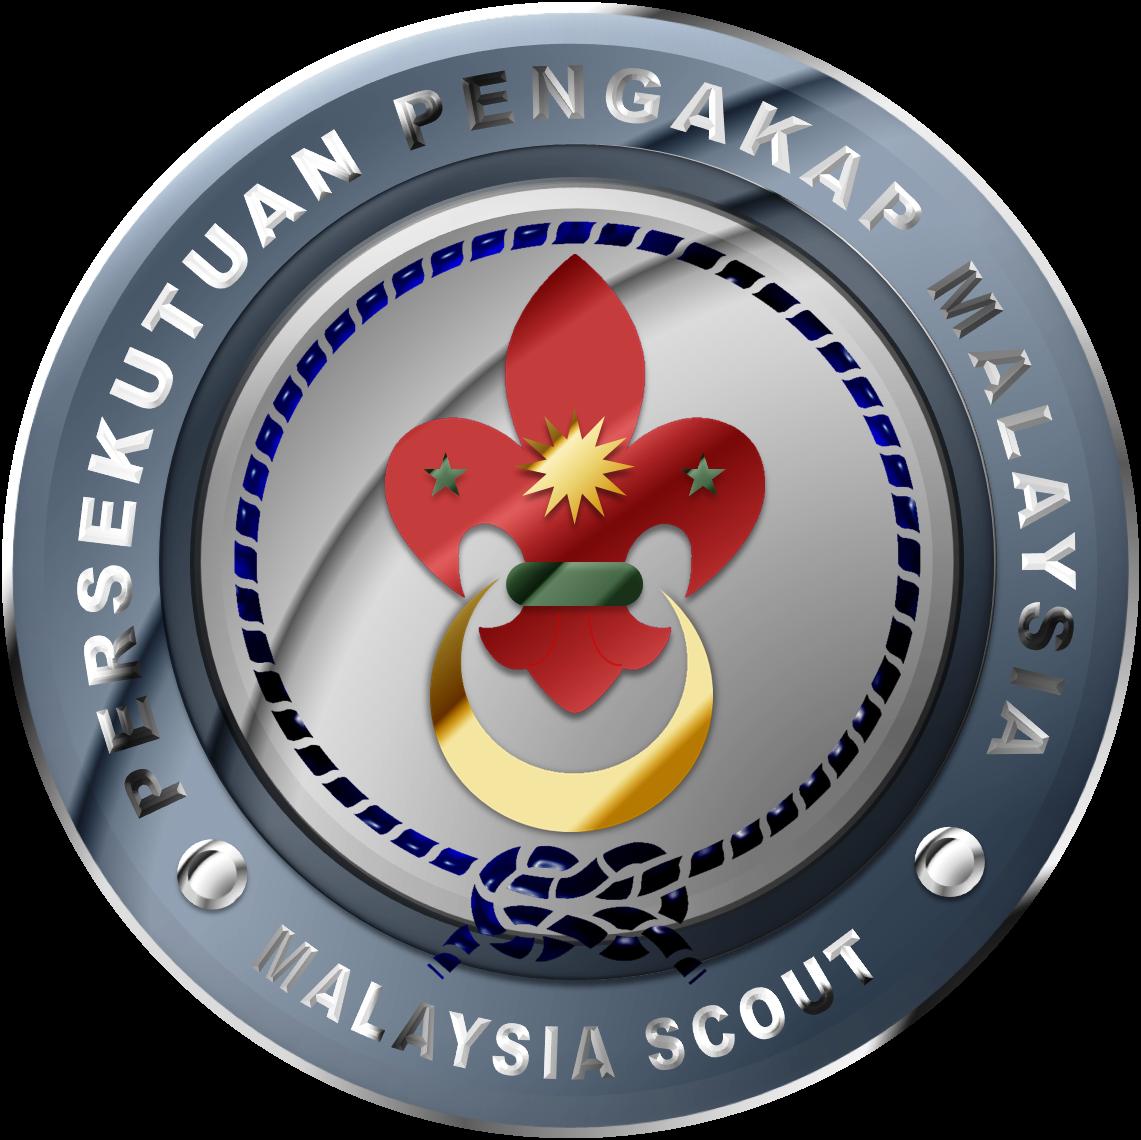 Tribute to Persekutuan Pengakap Malaysia Blackpink